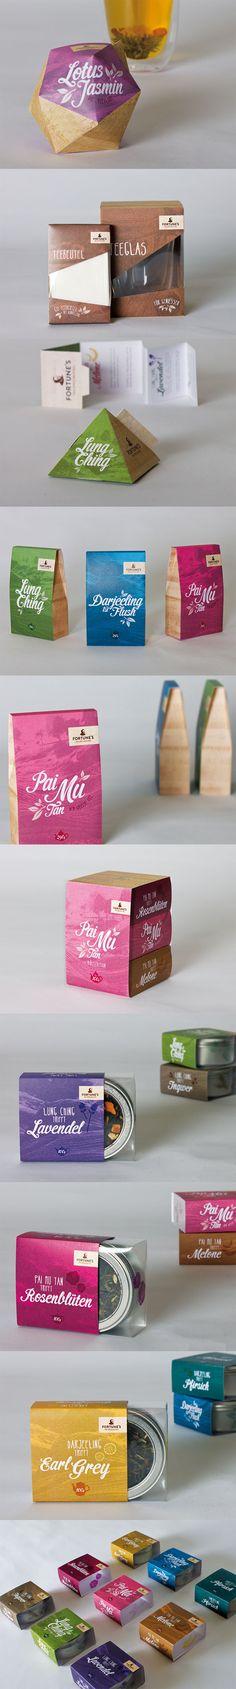 Fortune's Tea Specialties #packaging PD